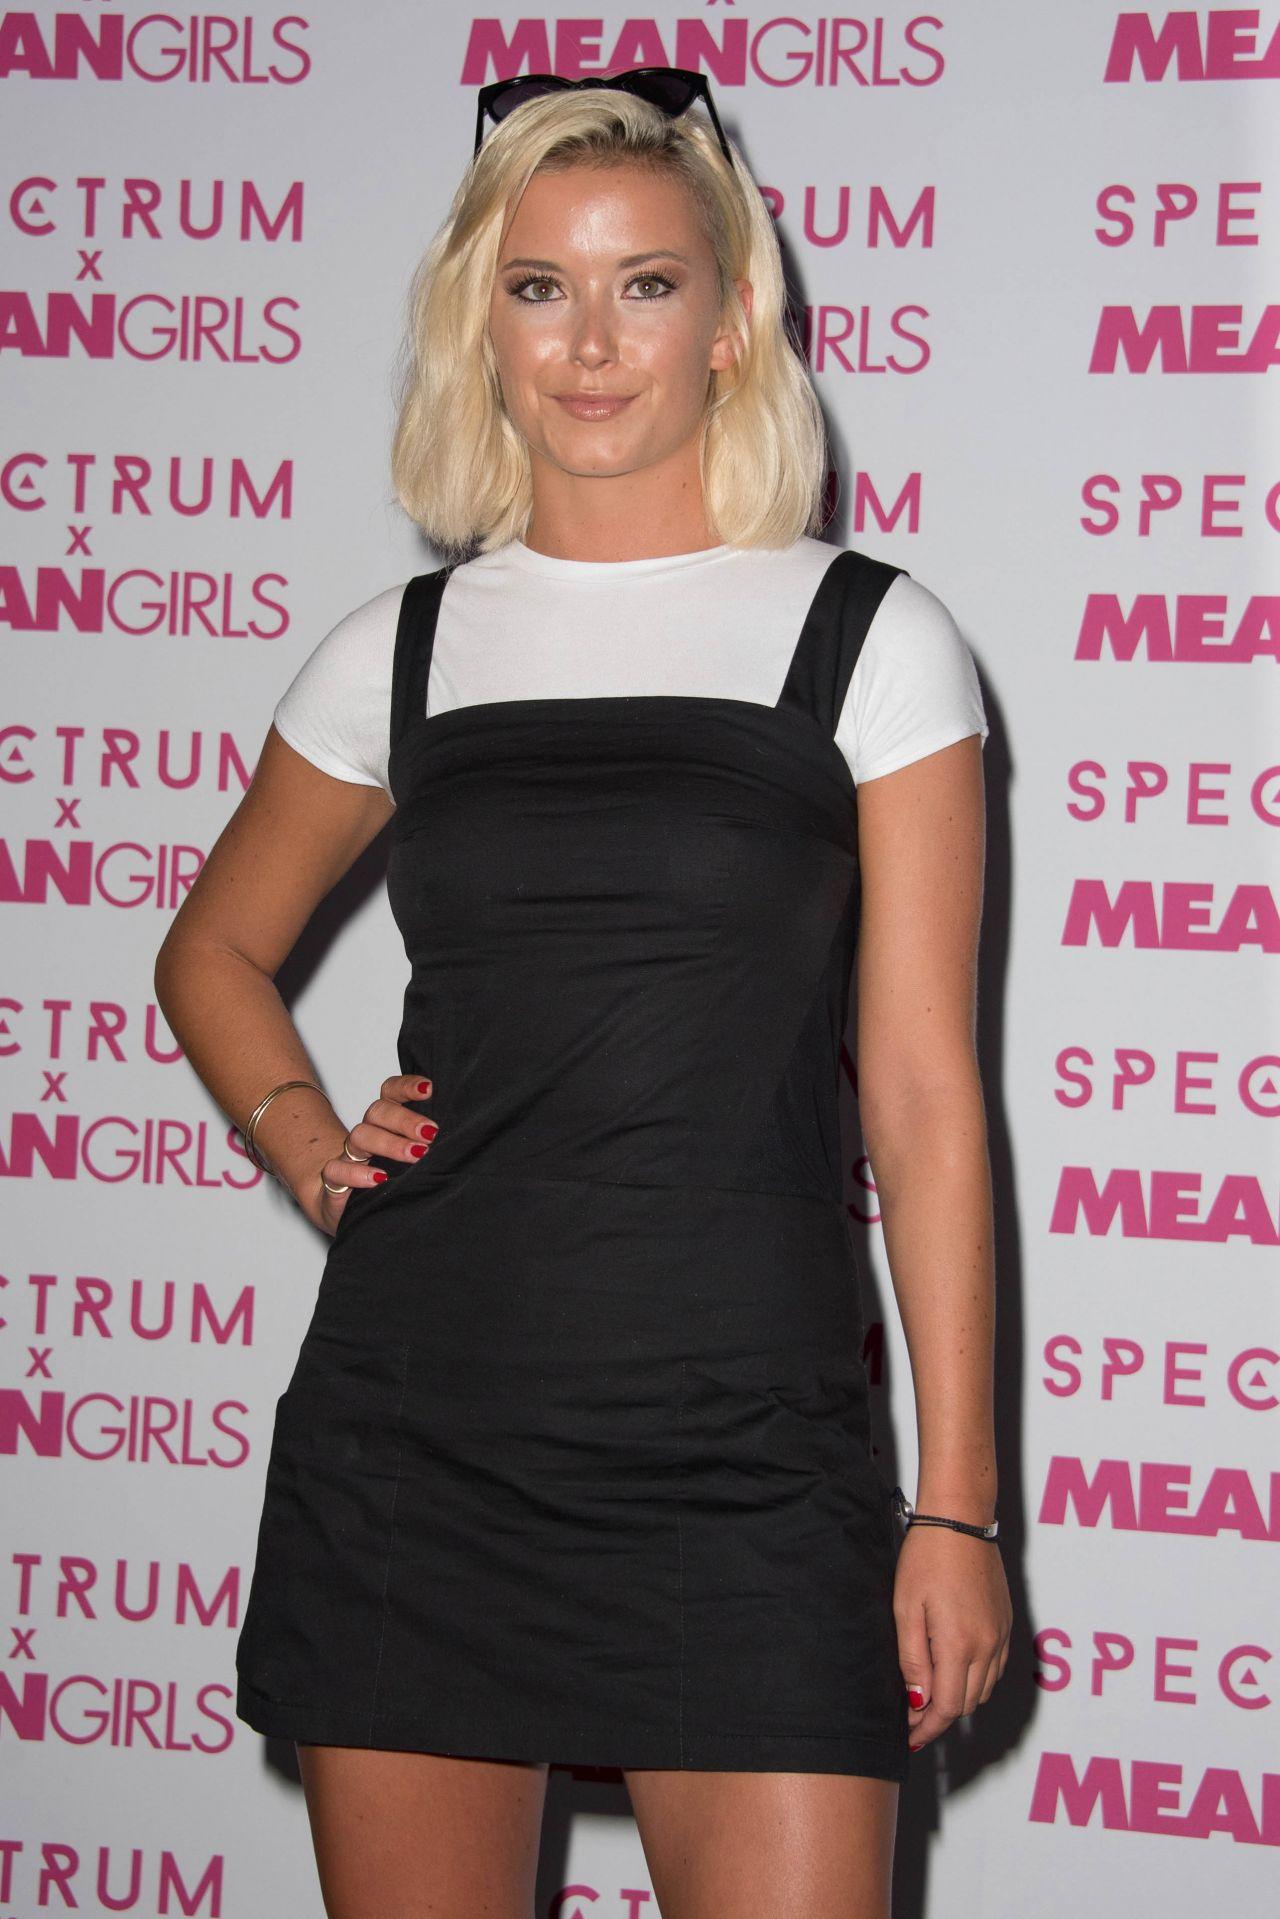 Olivia Bentley Spectrum And Mean Girls Burn Book Launch